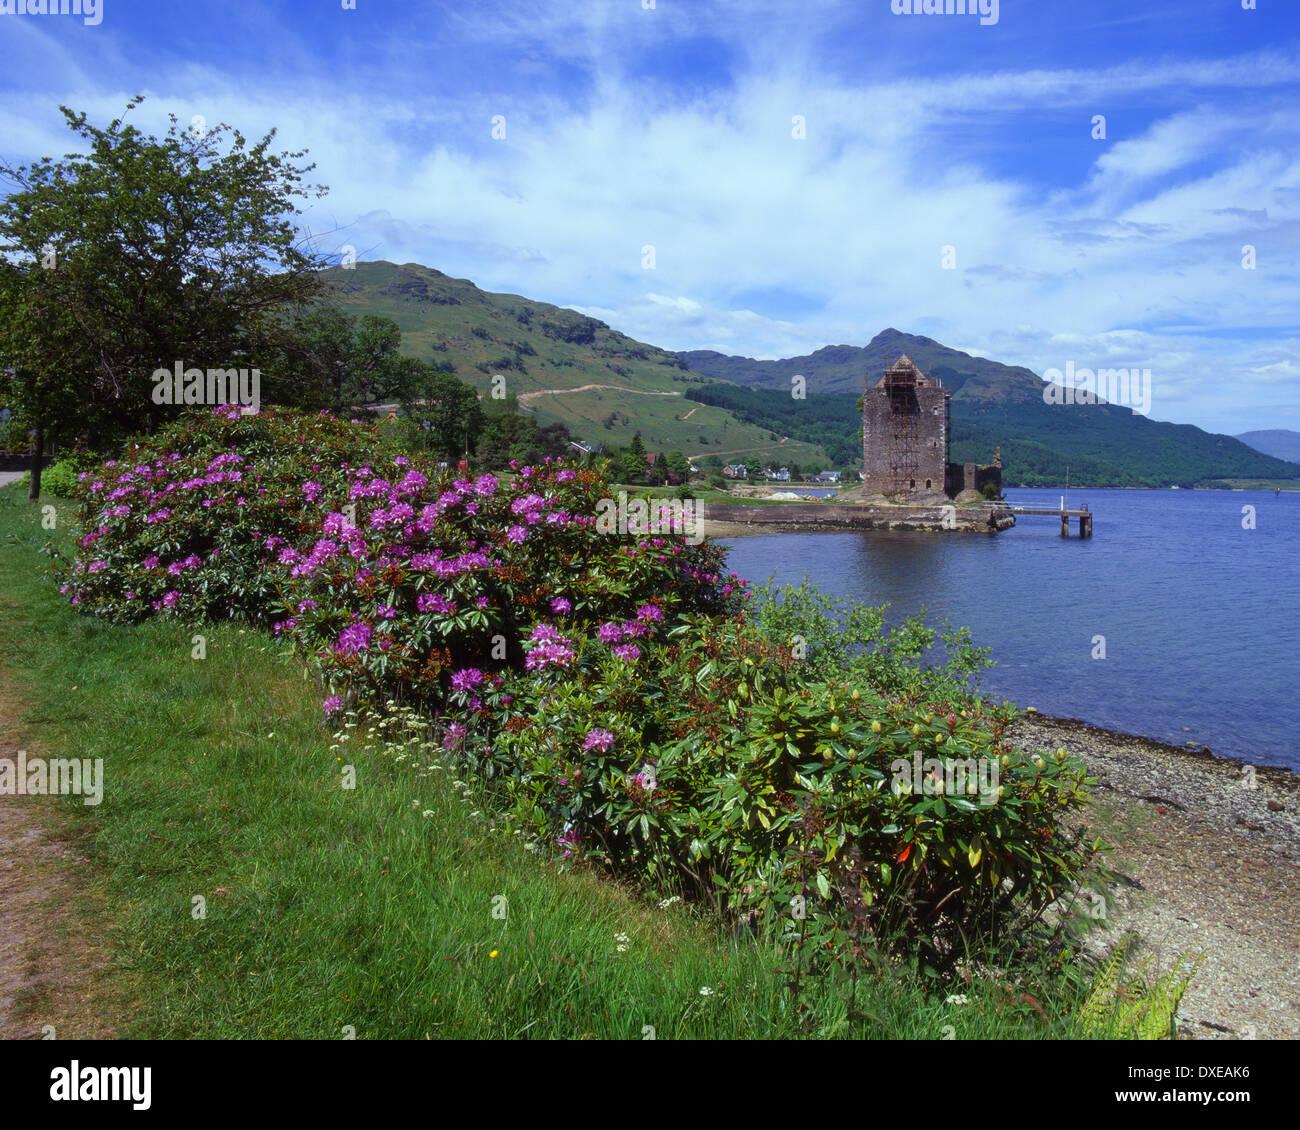 springtime view from shore of Loch Goil towards Carrick castle,Argyllshire,scotland Stock Photo